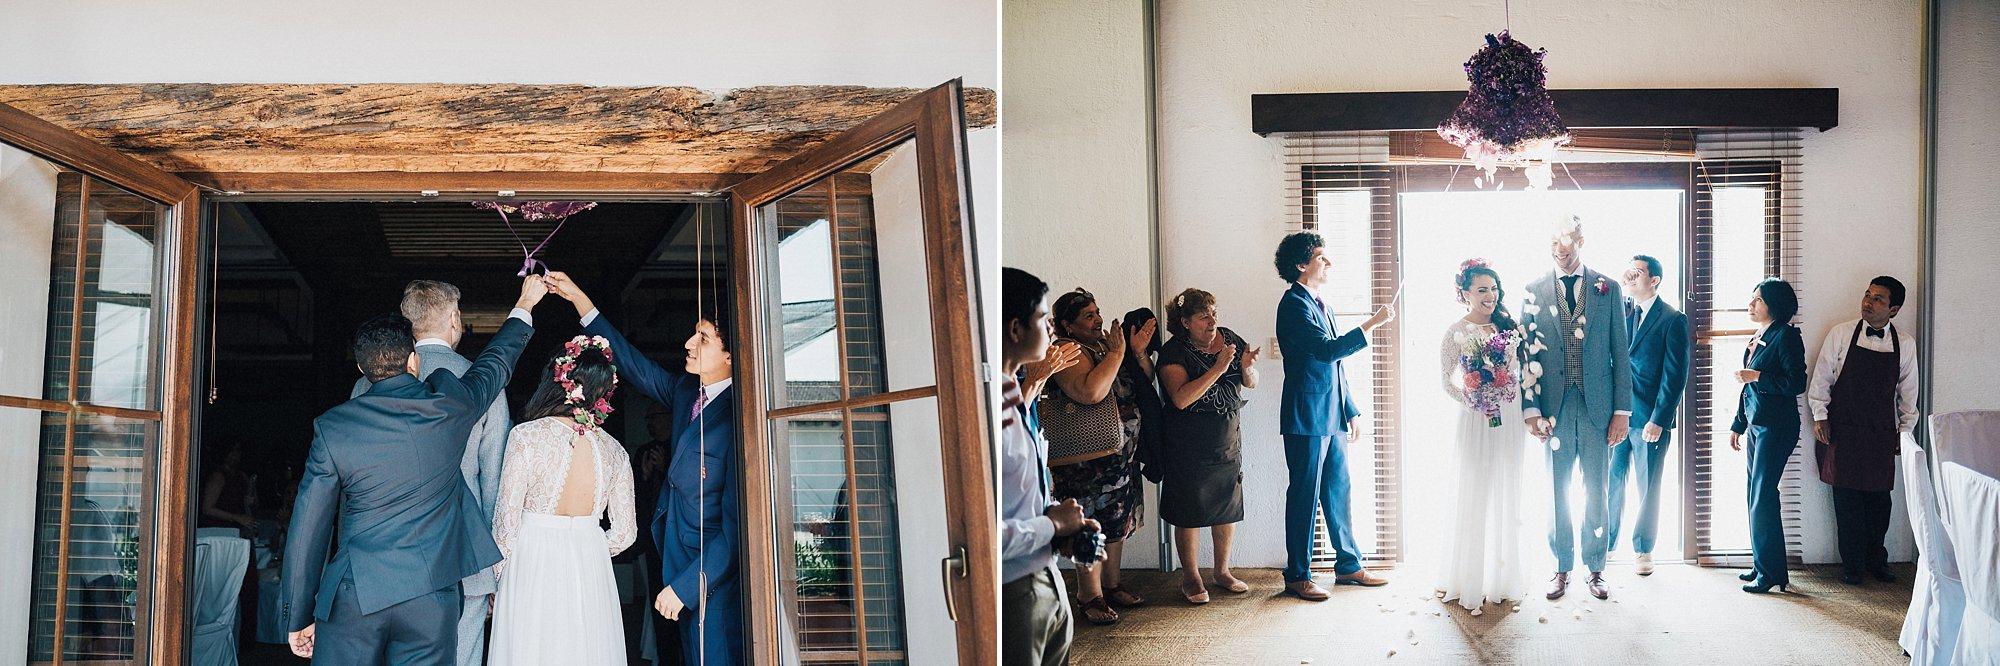 alex-yazmin-wedding-photographer-antigua-guatemala-098